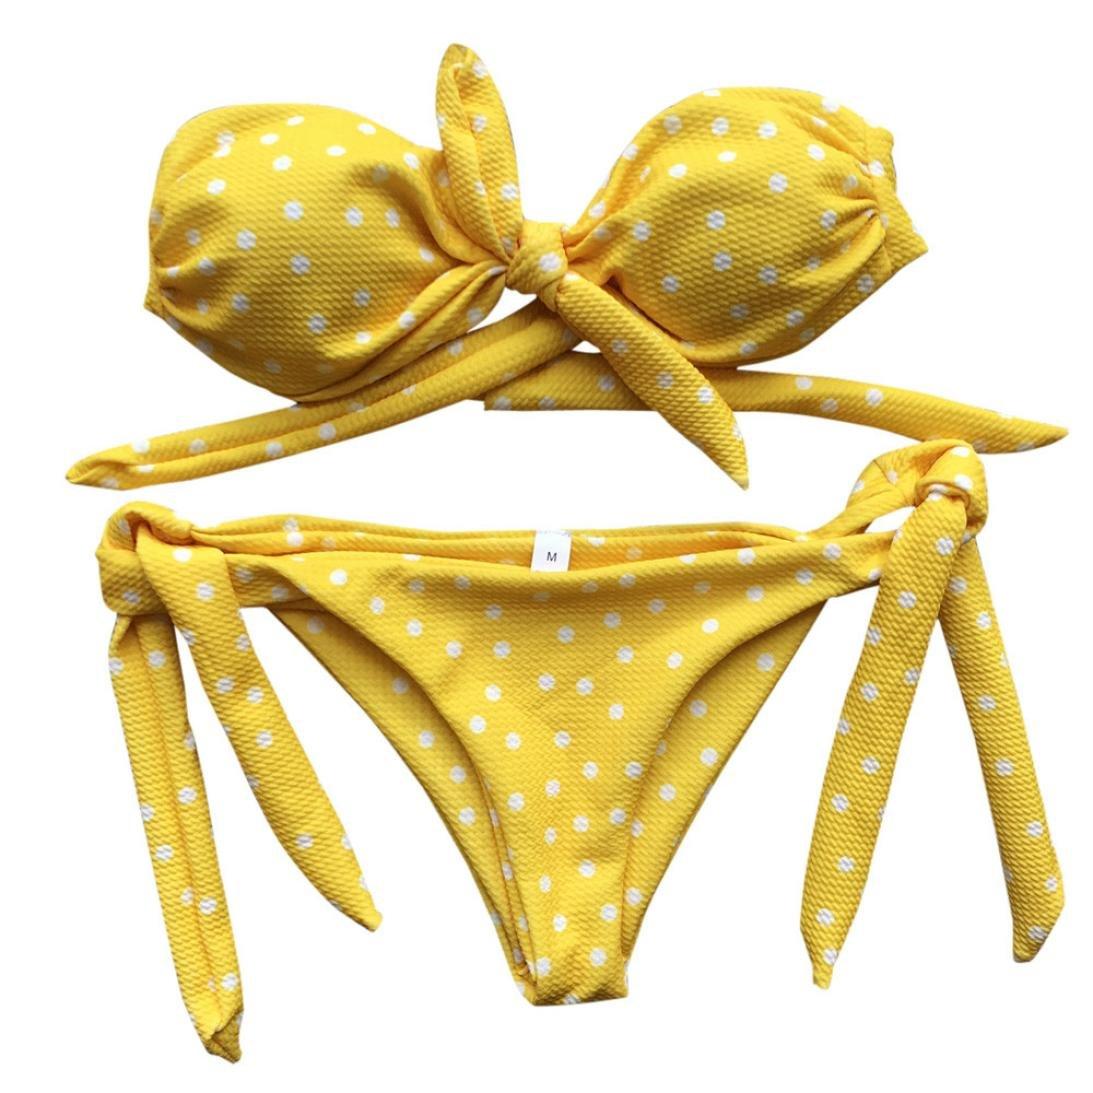 52409a60ec43e Rameng Sexy Bowknot Dot Imprimé Maillot De Bain Push-Up Bikini à ...